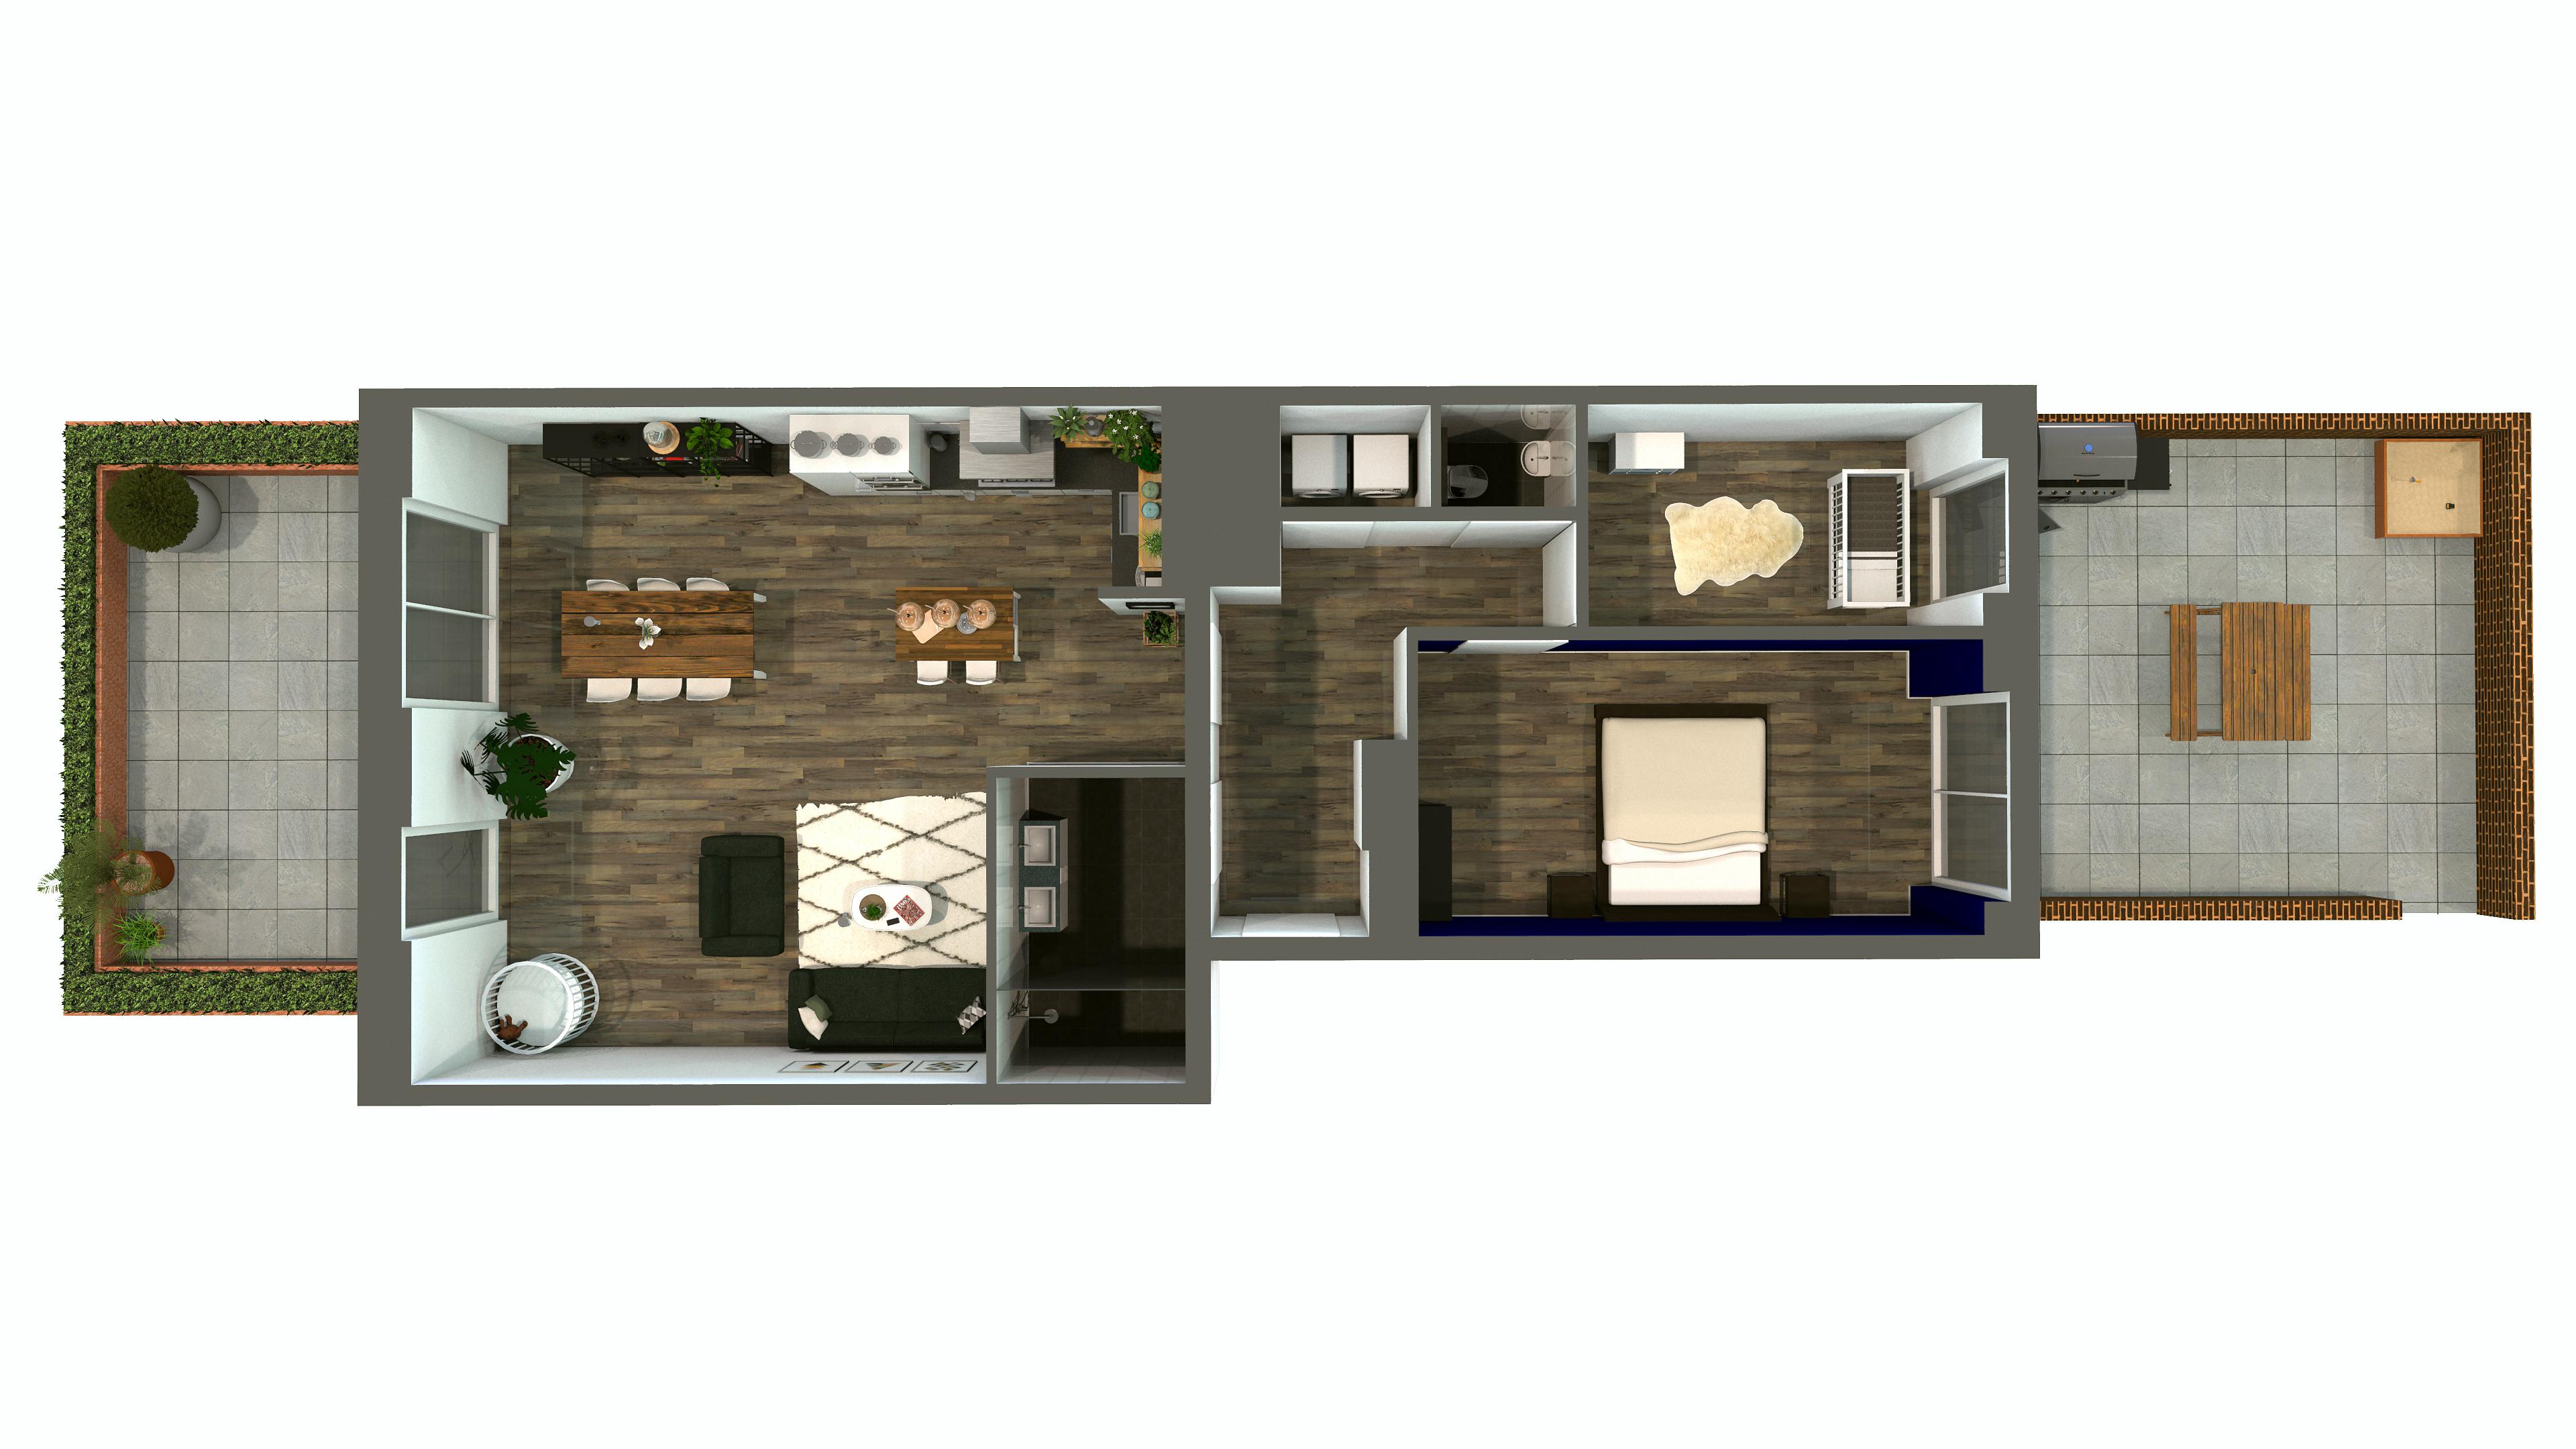 Plattegrond appartement 'De Belamy' Amsterdam